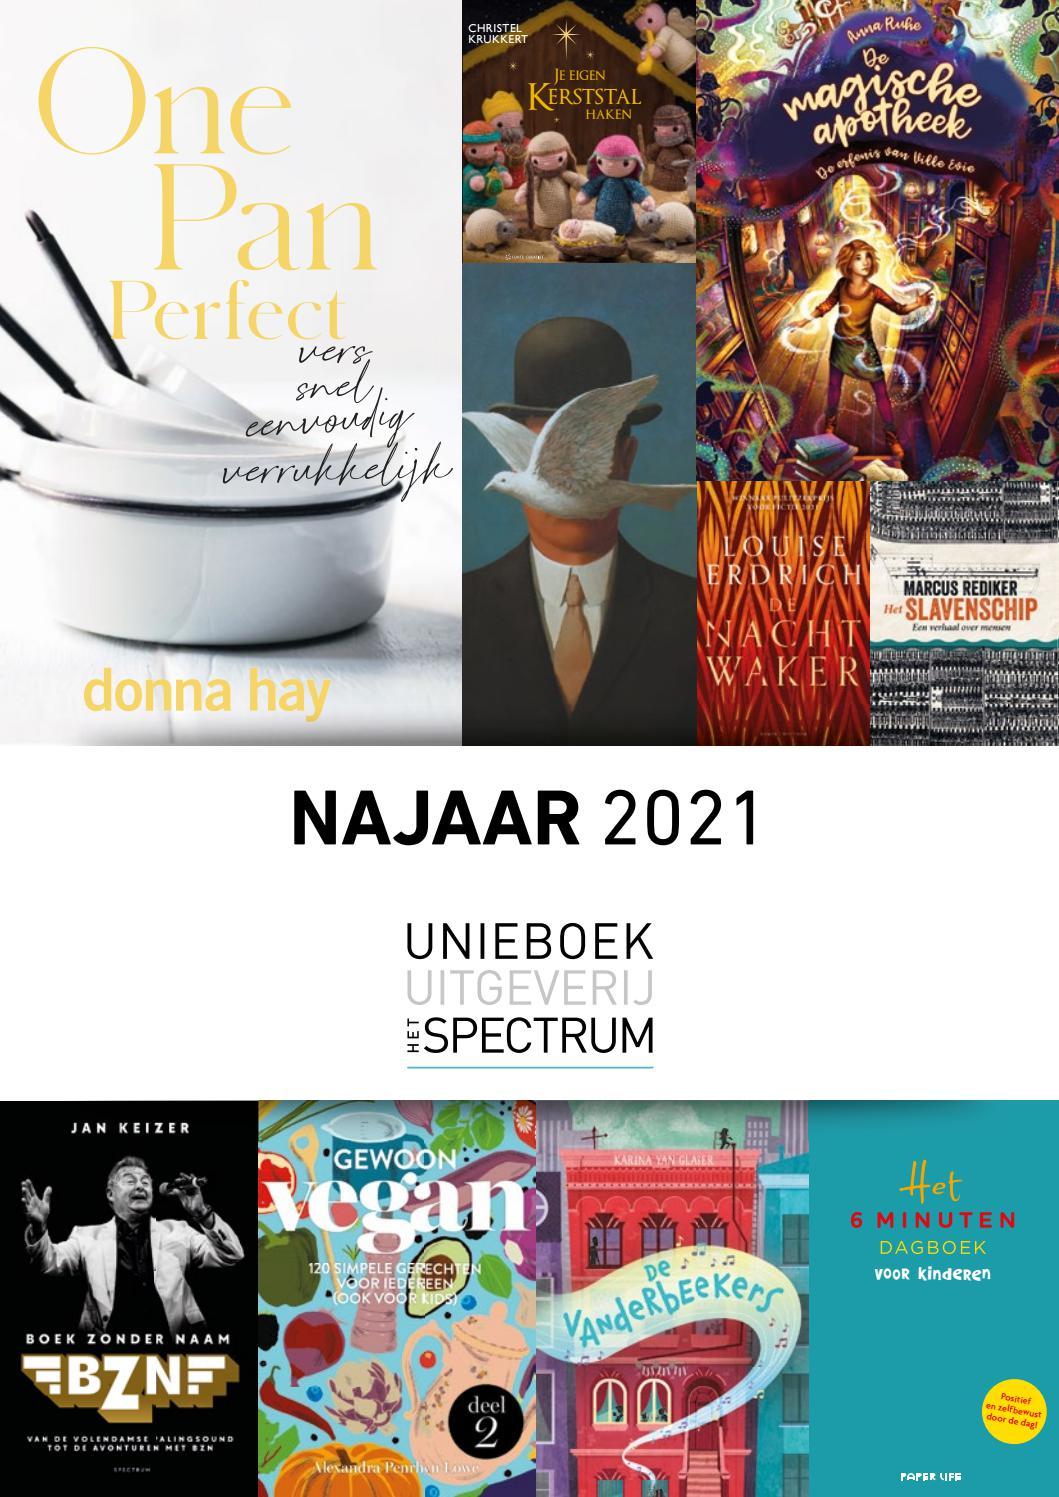 Najaarsaanbieding 2021 Unieboek Het Spectrum By Unieboek Het Spectrum Issuu